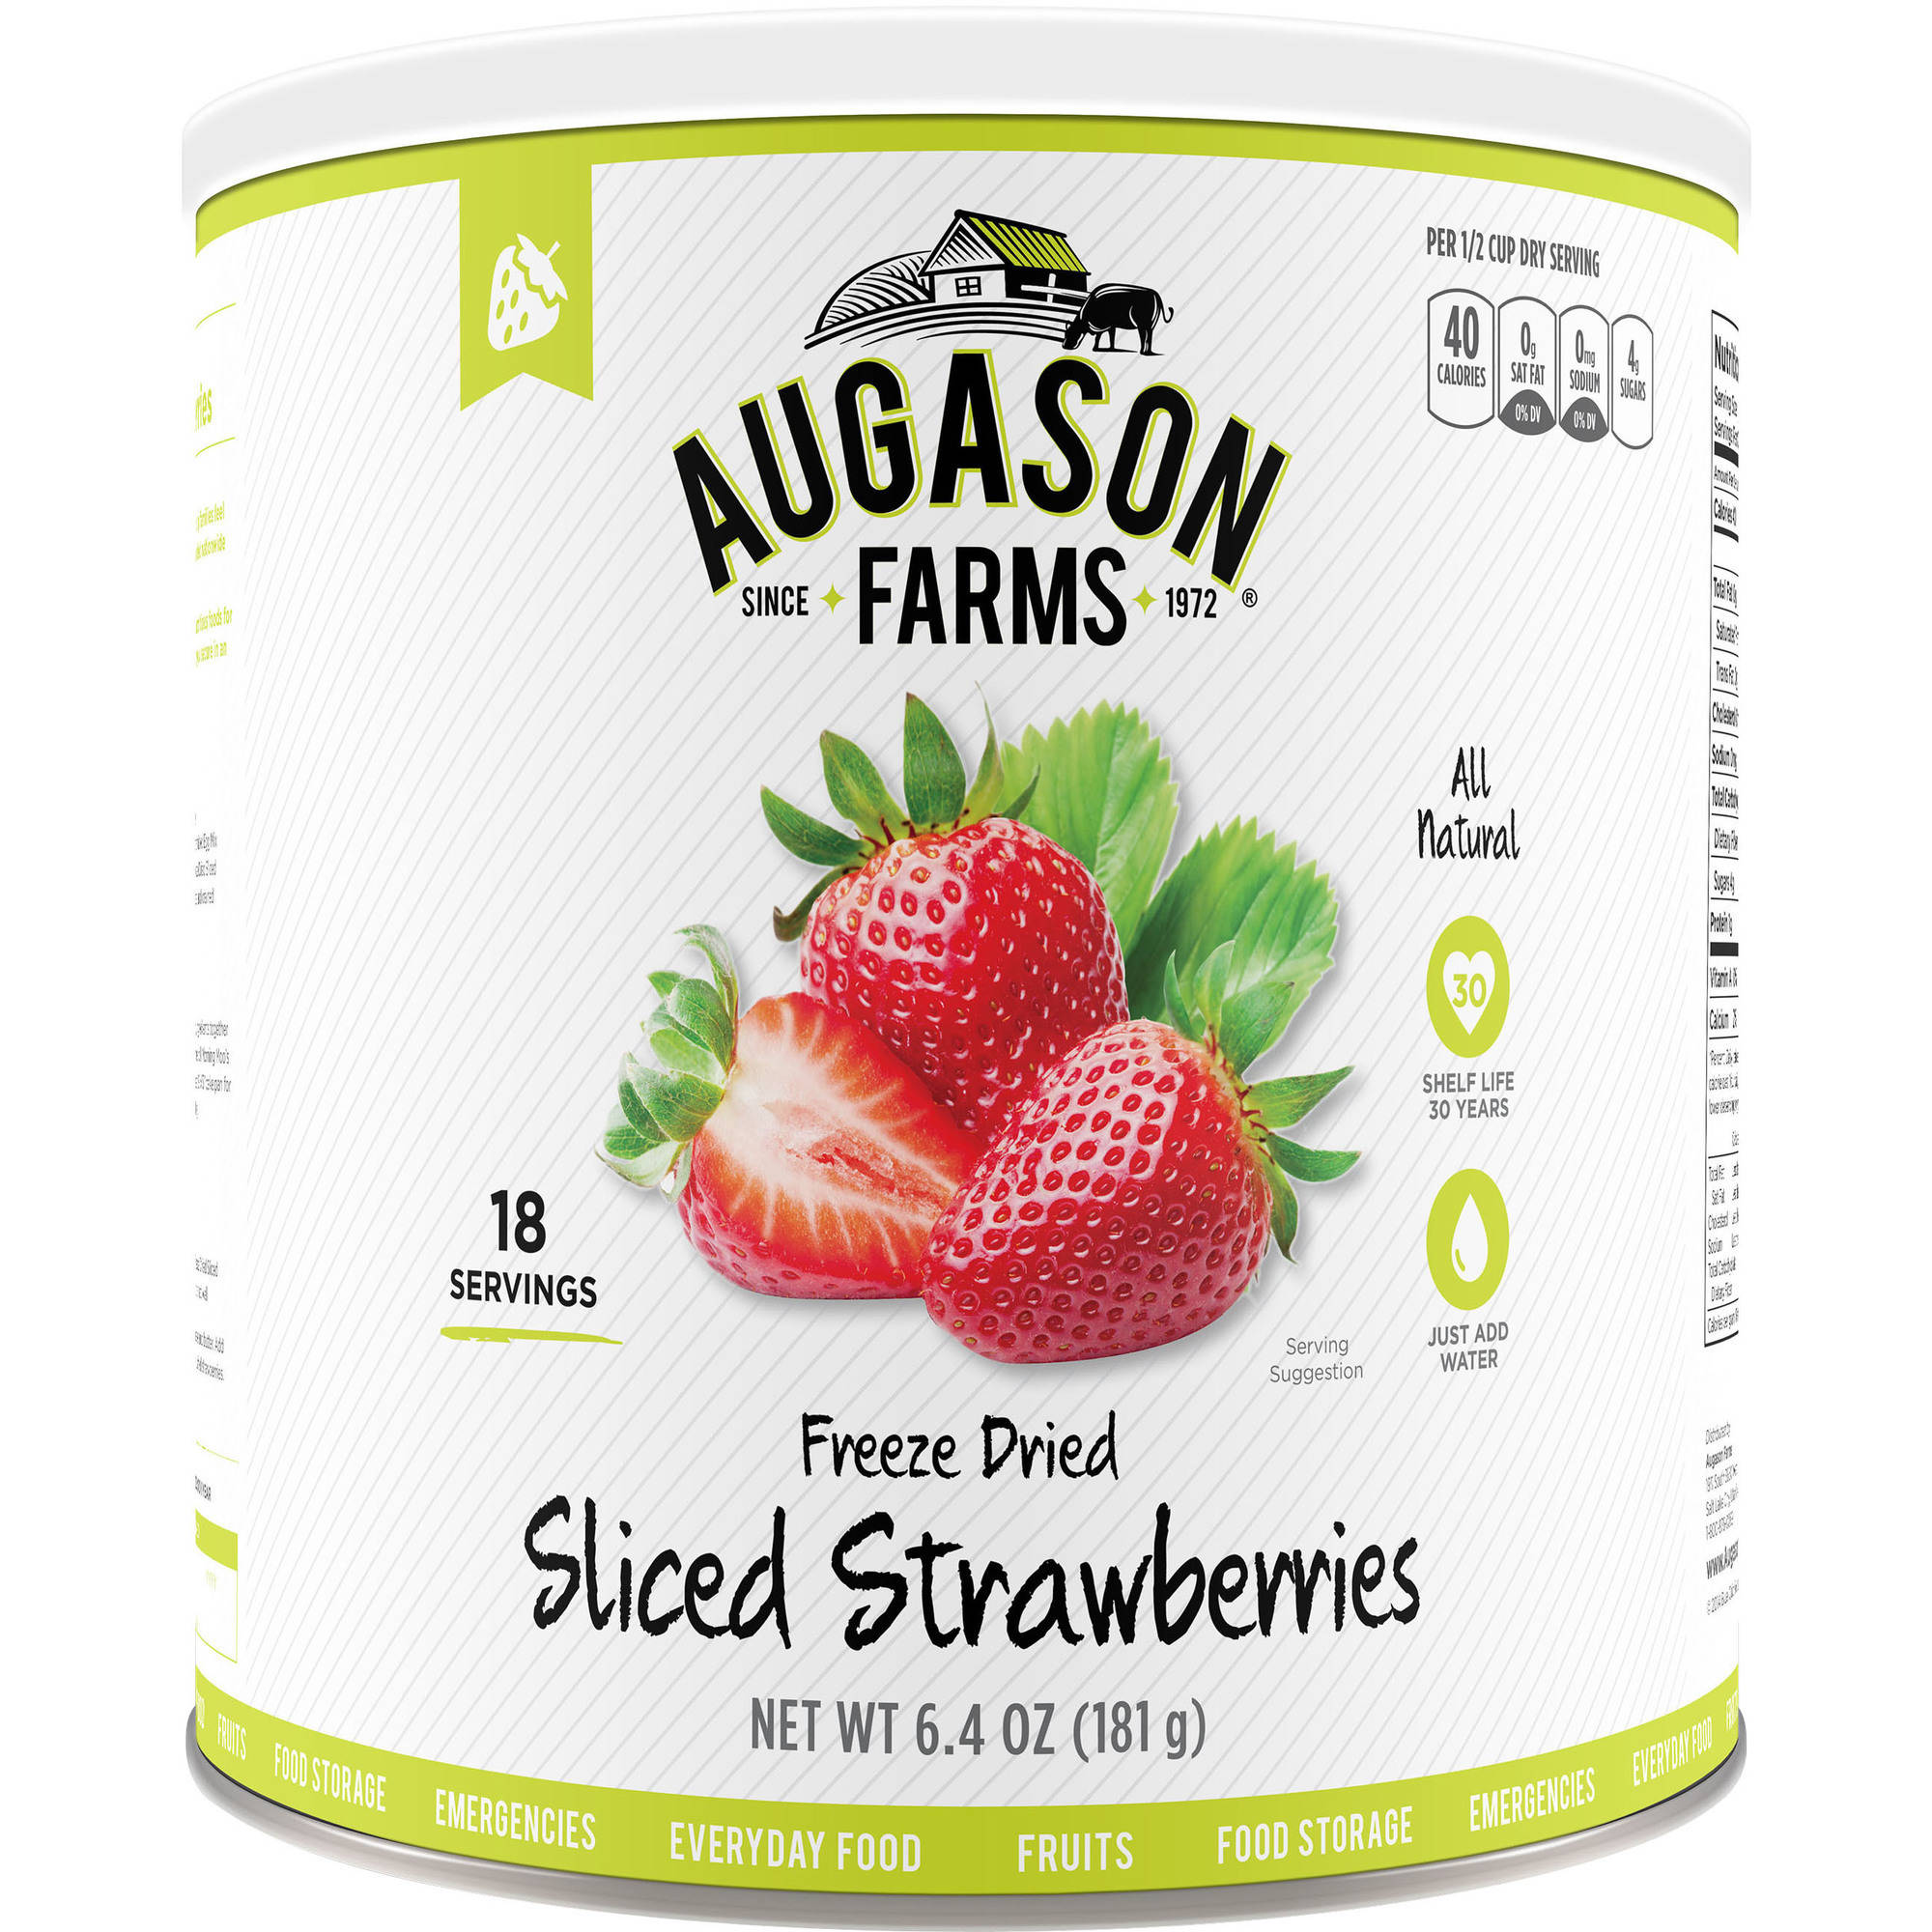 Augason Farms Emergency Food Freeze Dried Sliced Strawberries, 6.4 oz